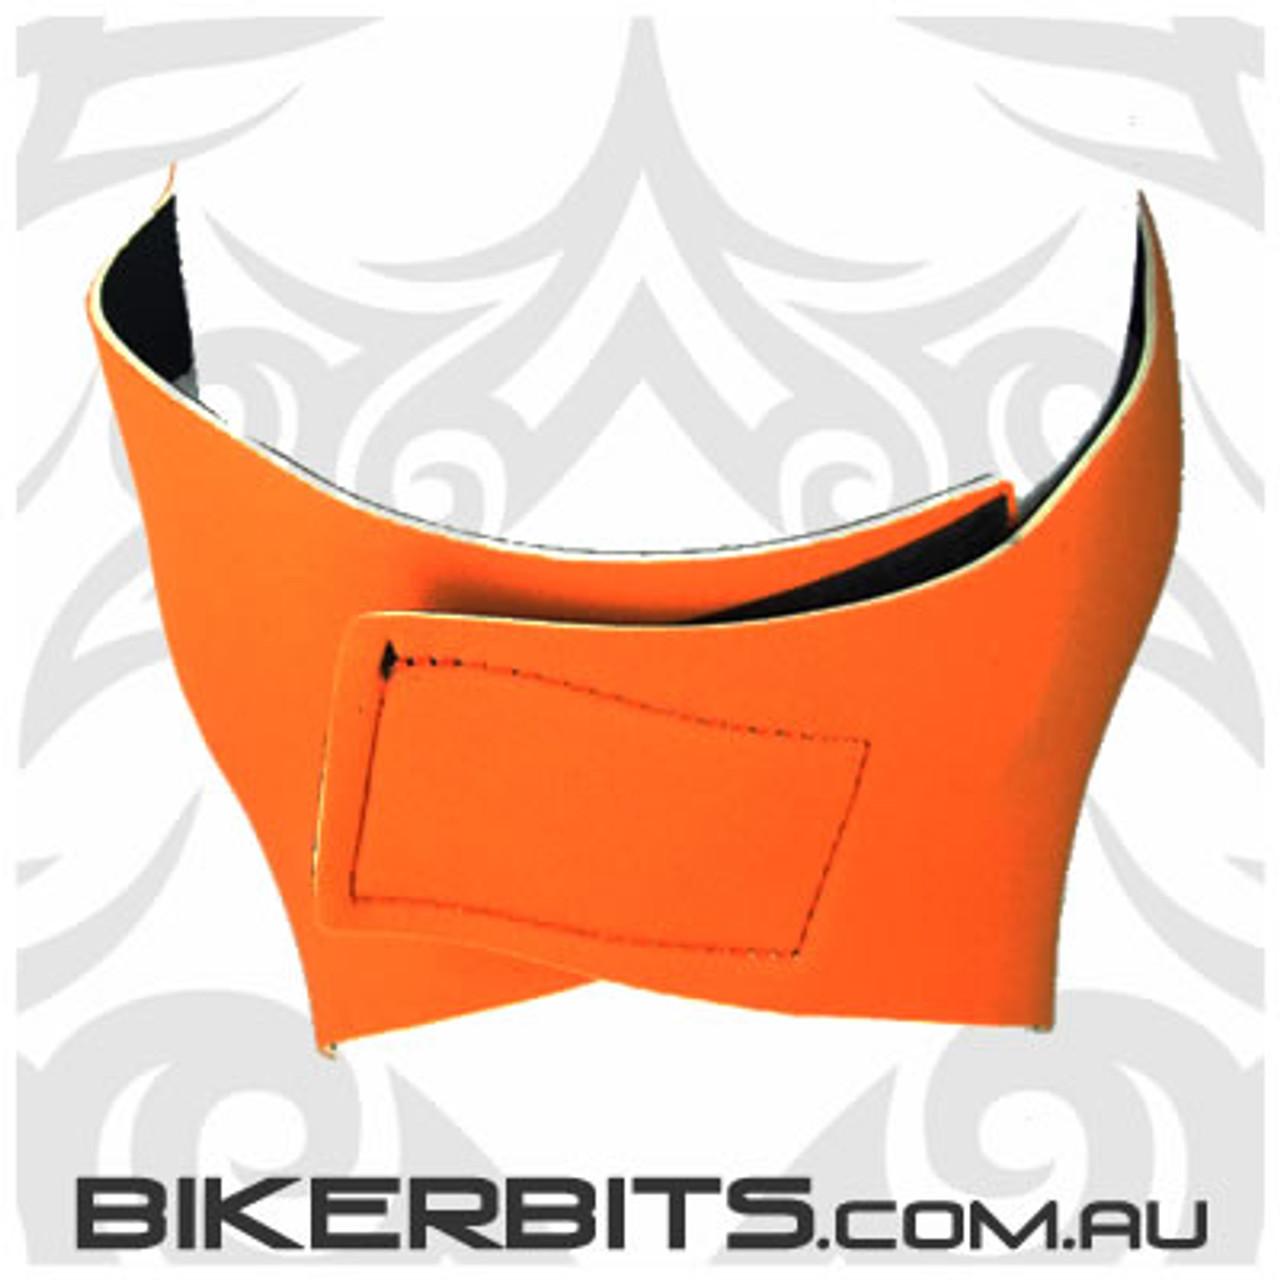 Headwear - Neoprene Full Face Mask - Orange